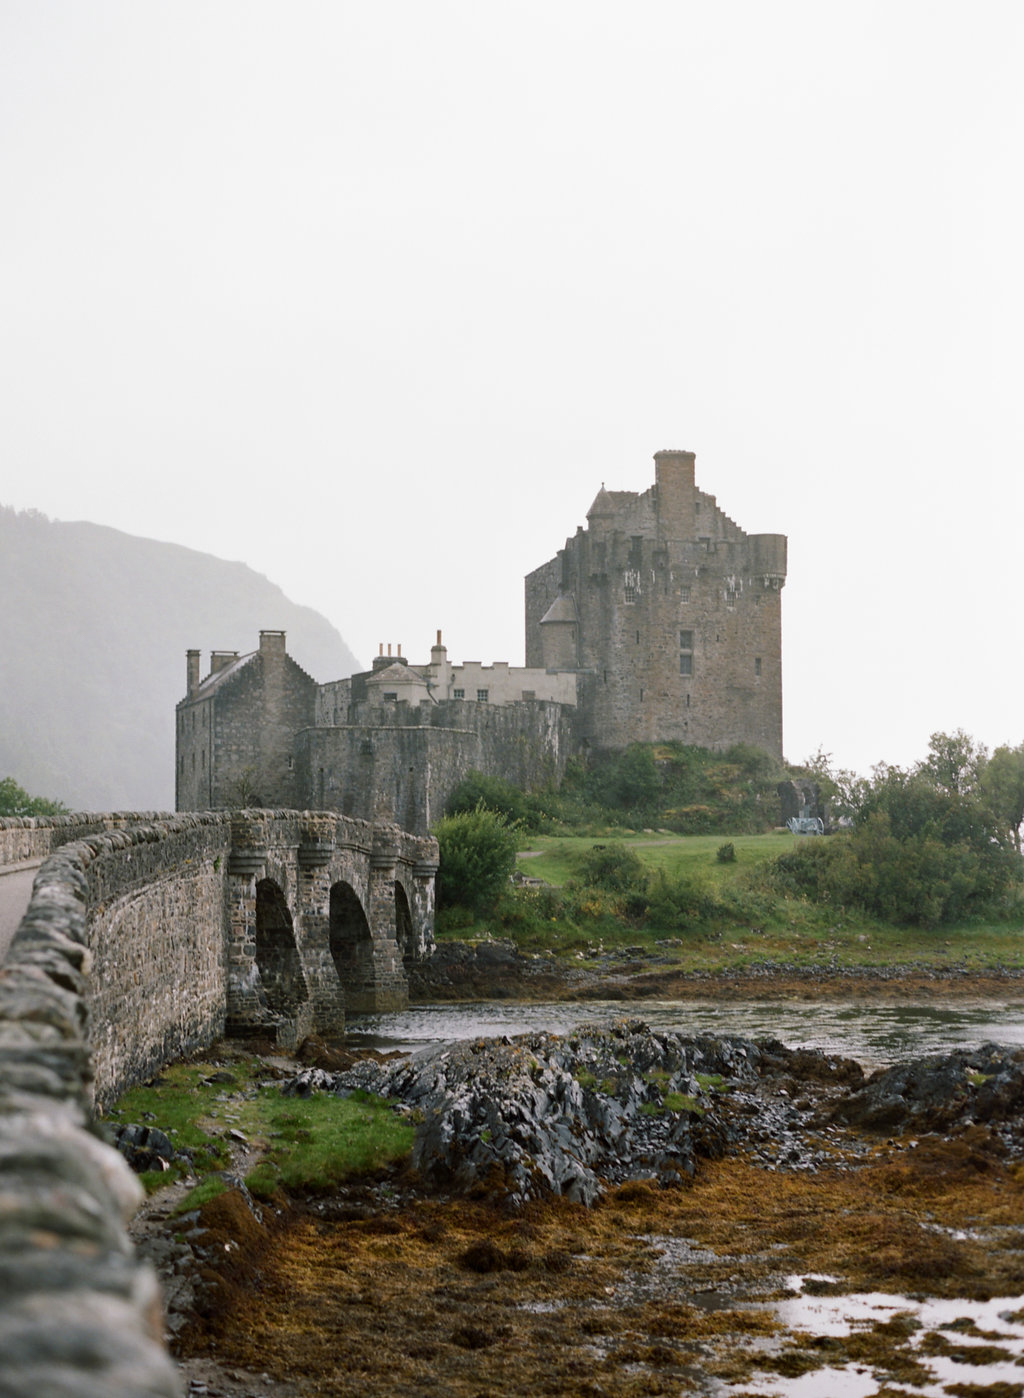 Scotland-Prewedding-highlands-castle-Engagment-Photos-Katie-Grant (130 of 139).jpg